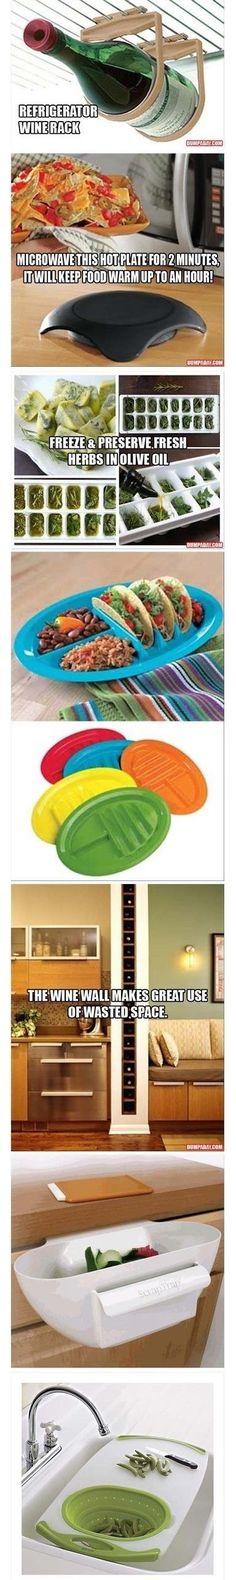 7 Cool Kitchen Gadgets & Ideas!!